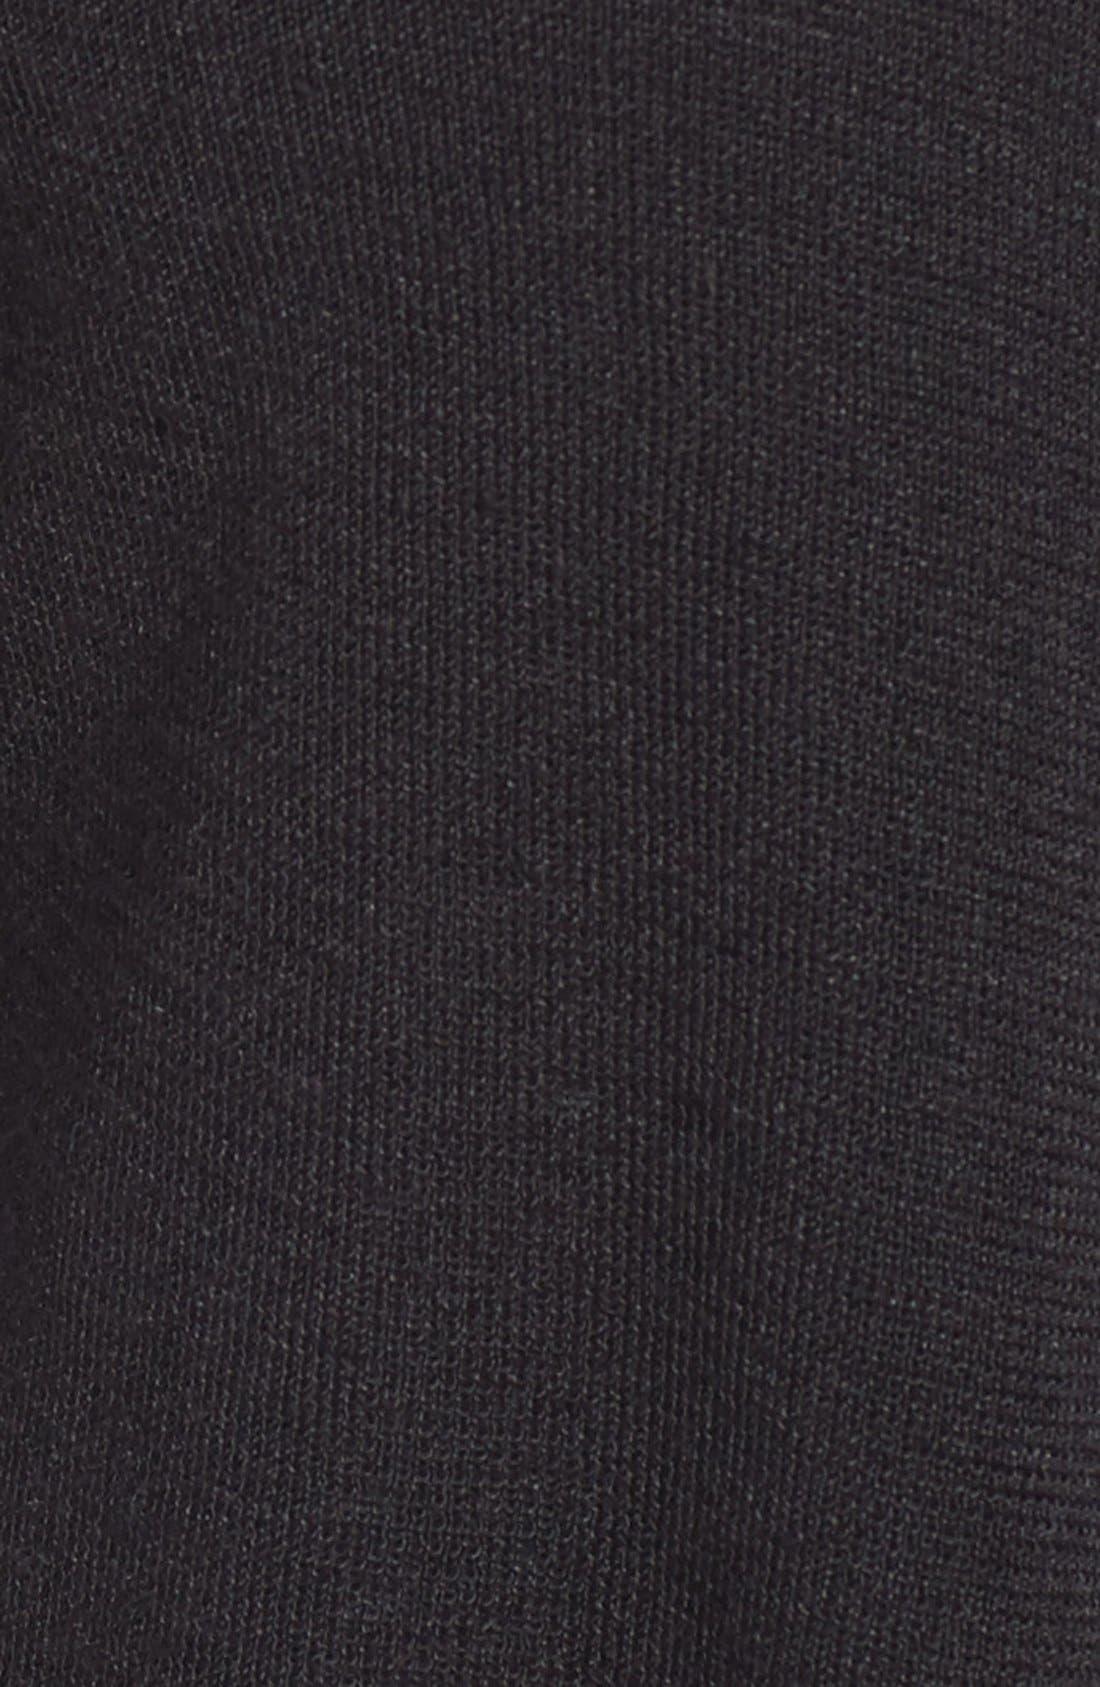 Open Blazer Cardigan,                             Alternate thumbnail 8, color,                             BLACK ONYX